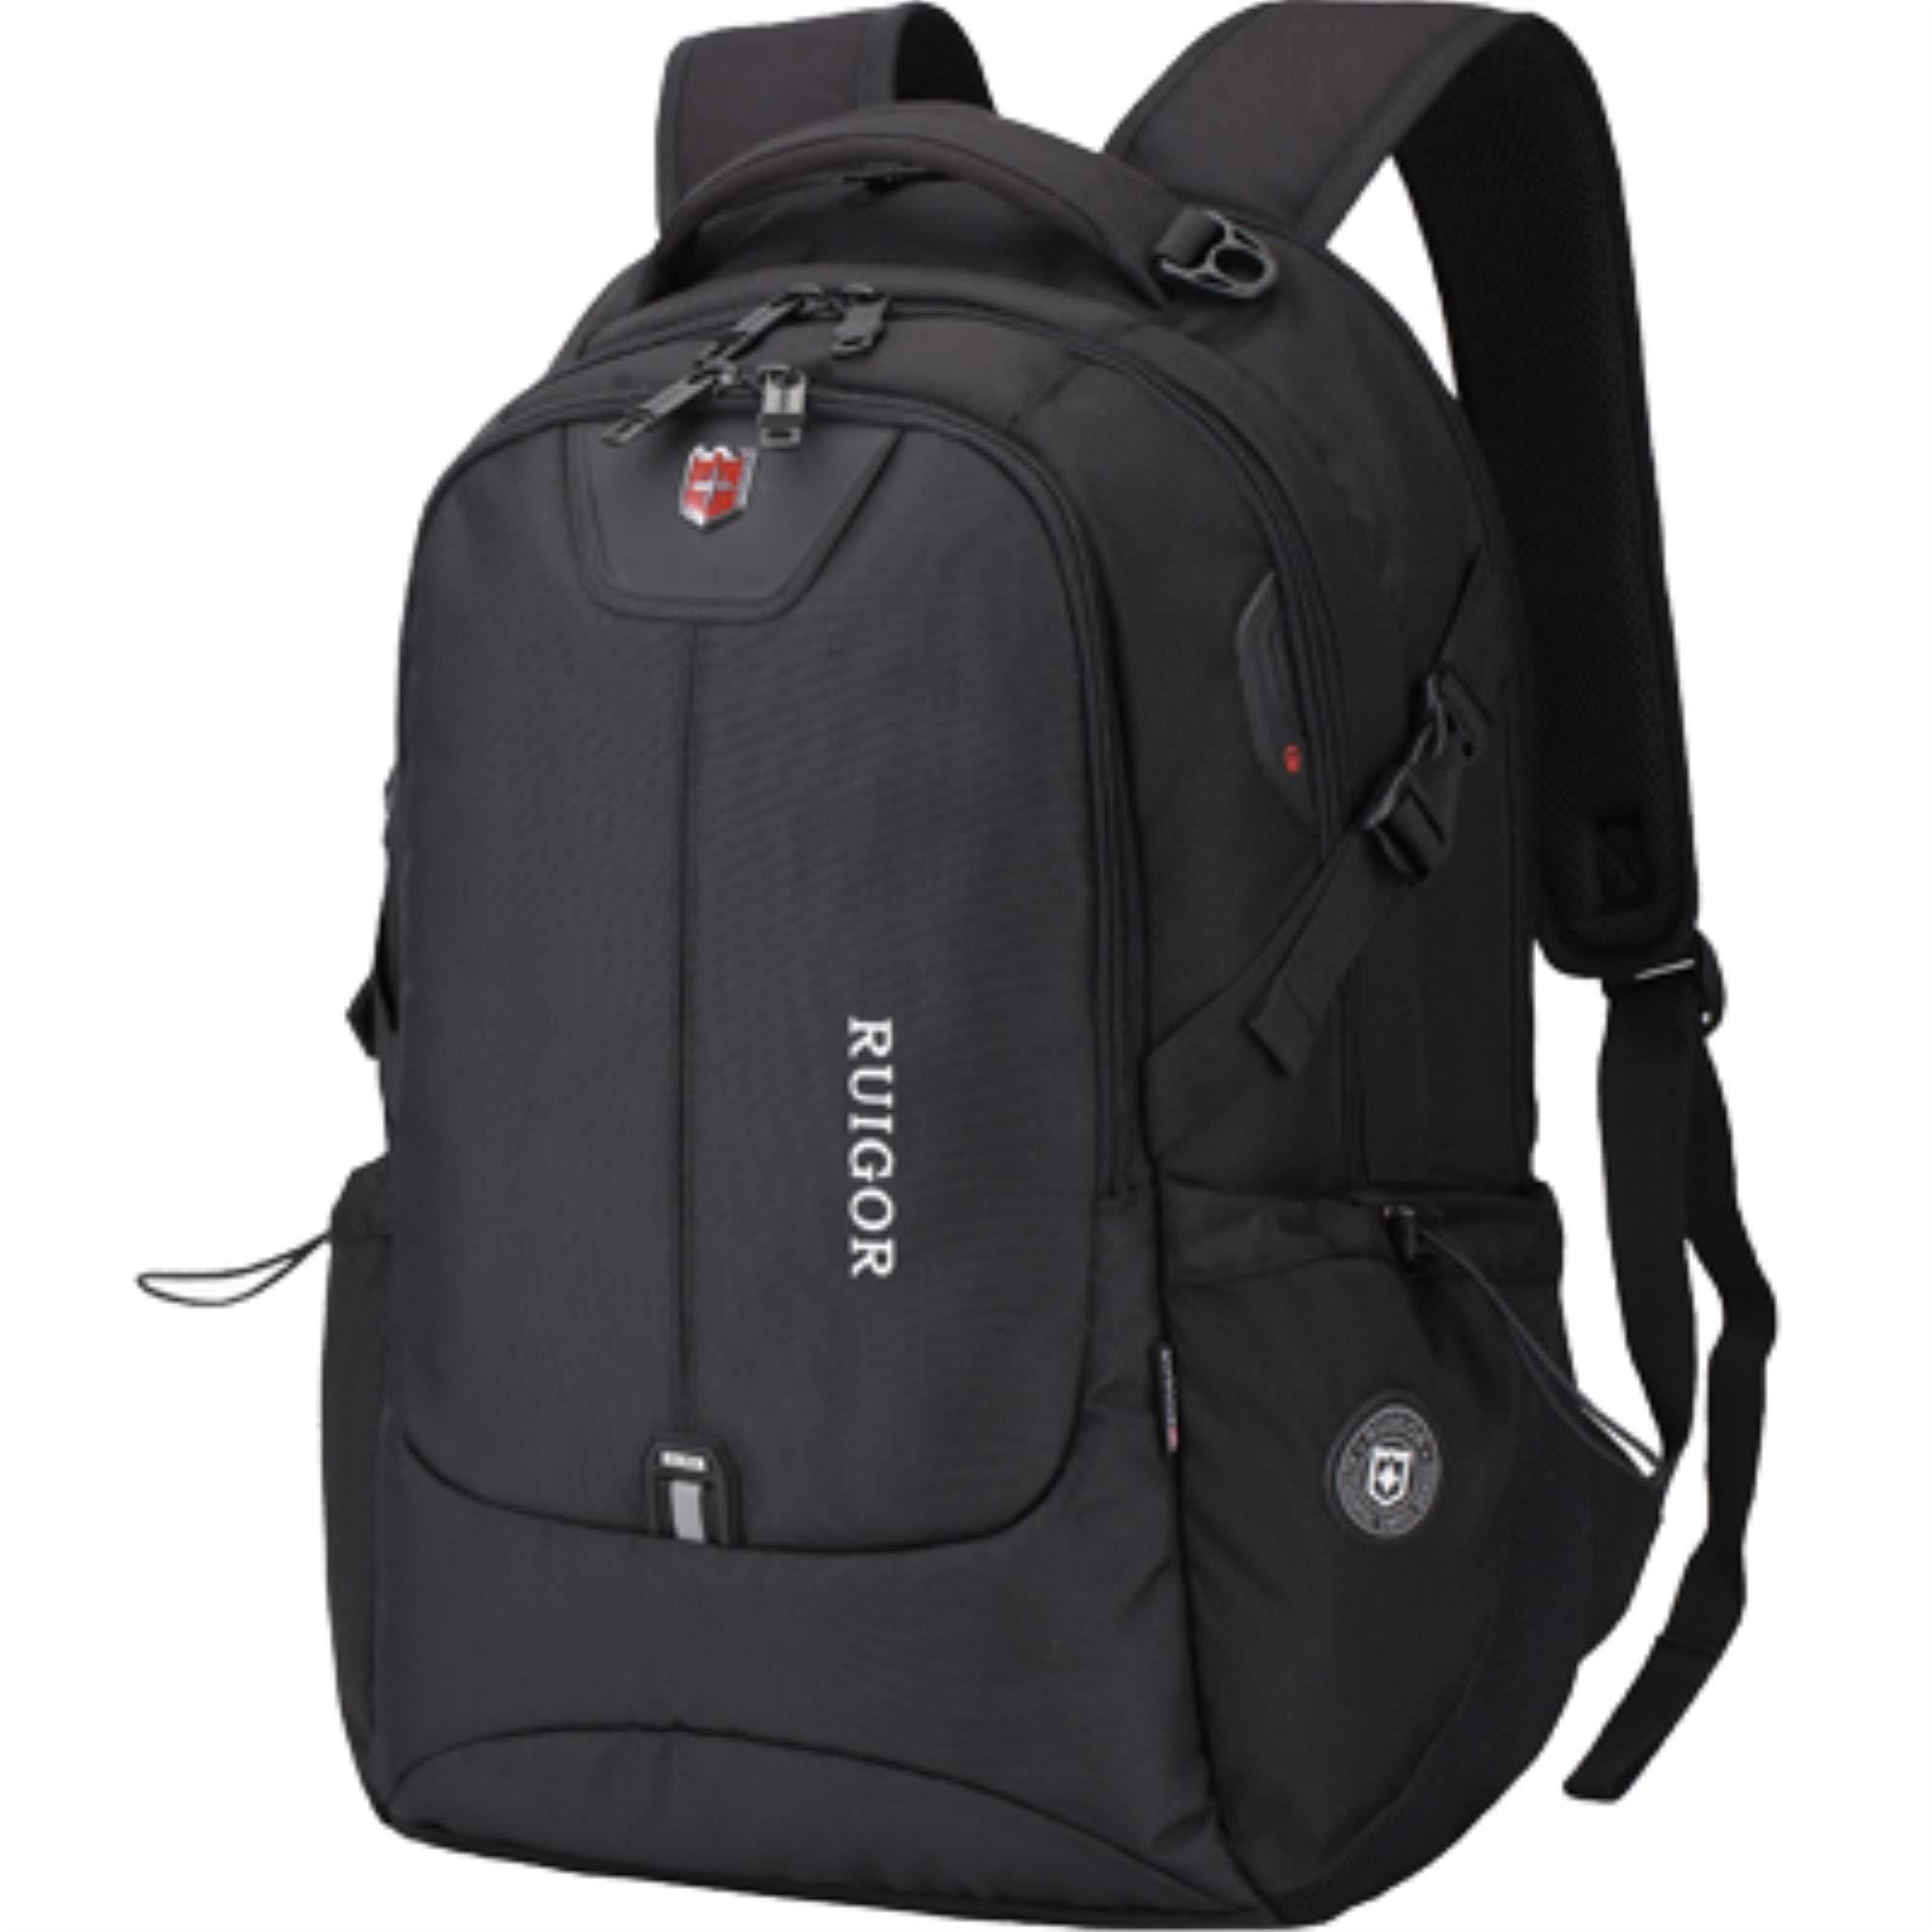 Ruigor RICB82-2N0SM Icon 82 Backpack, Black